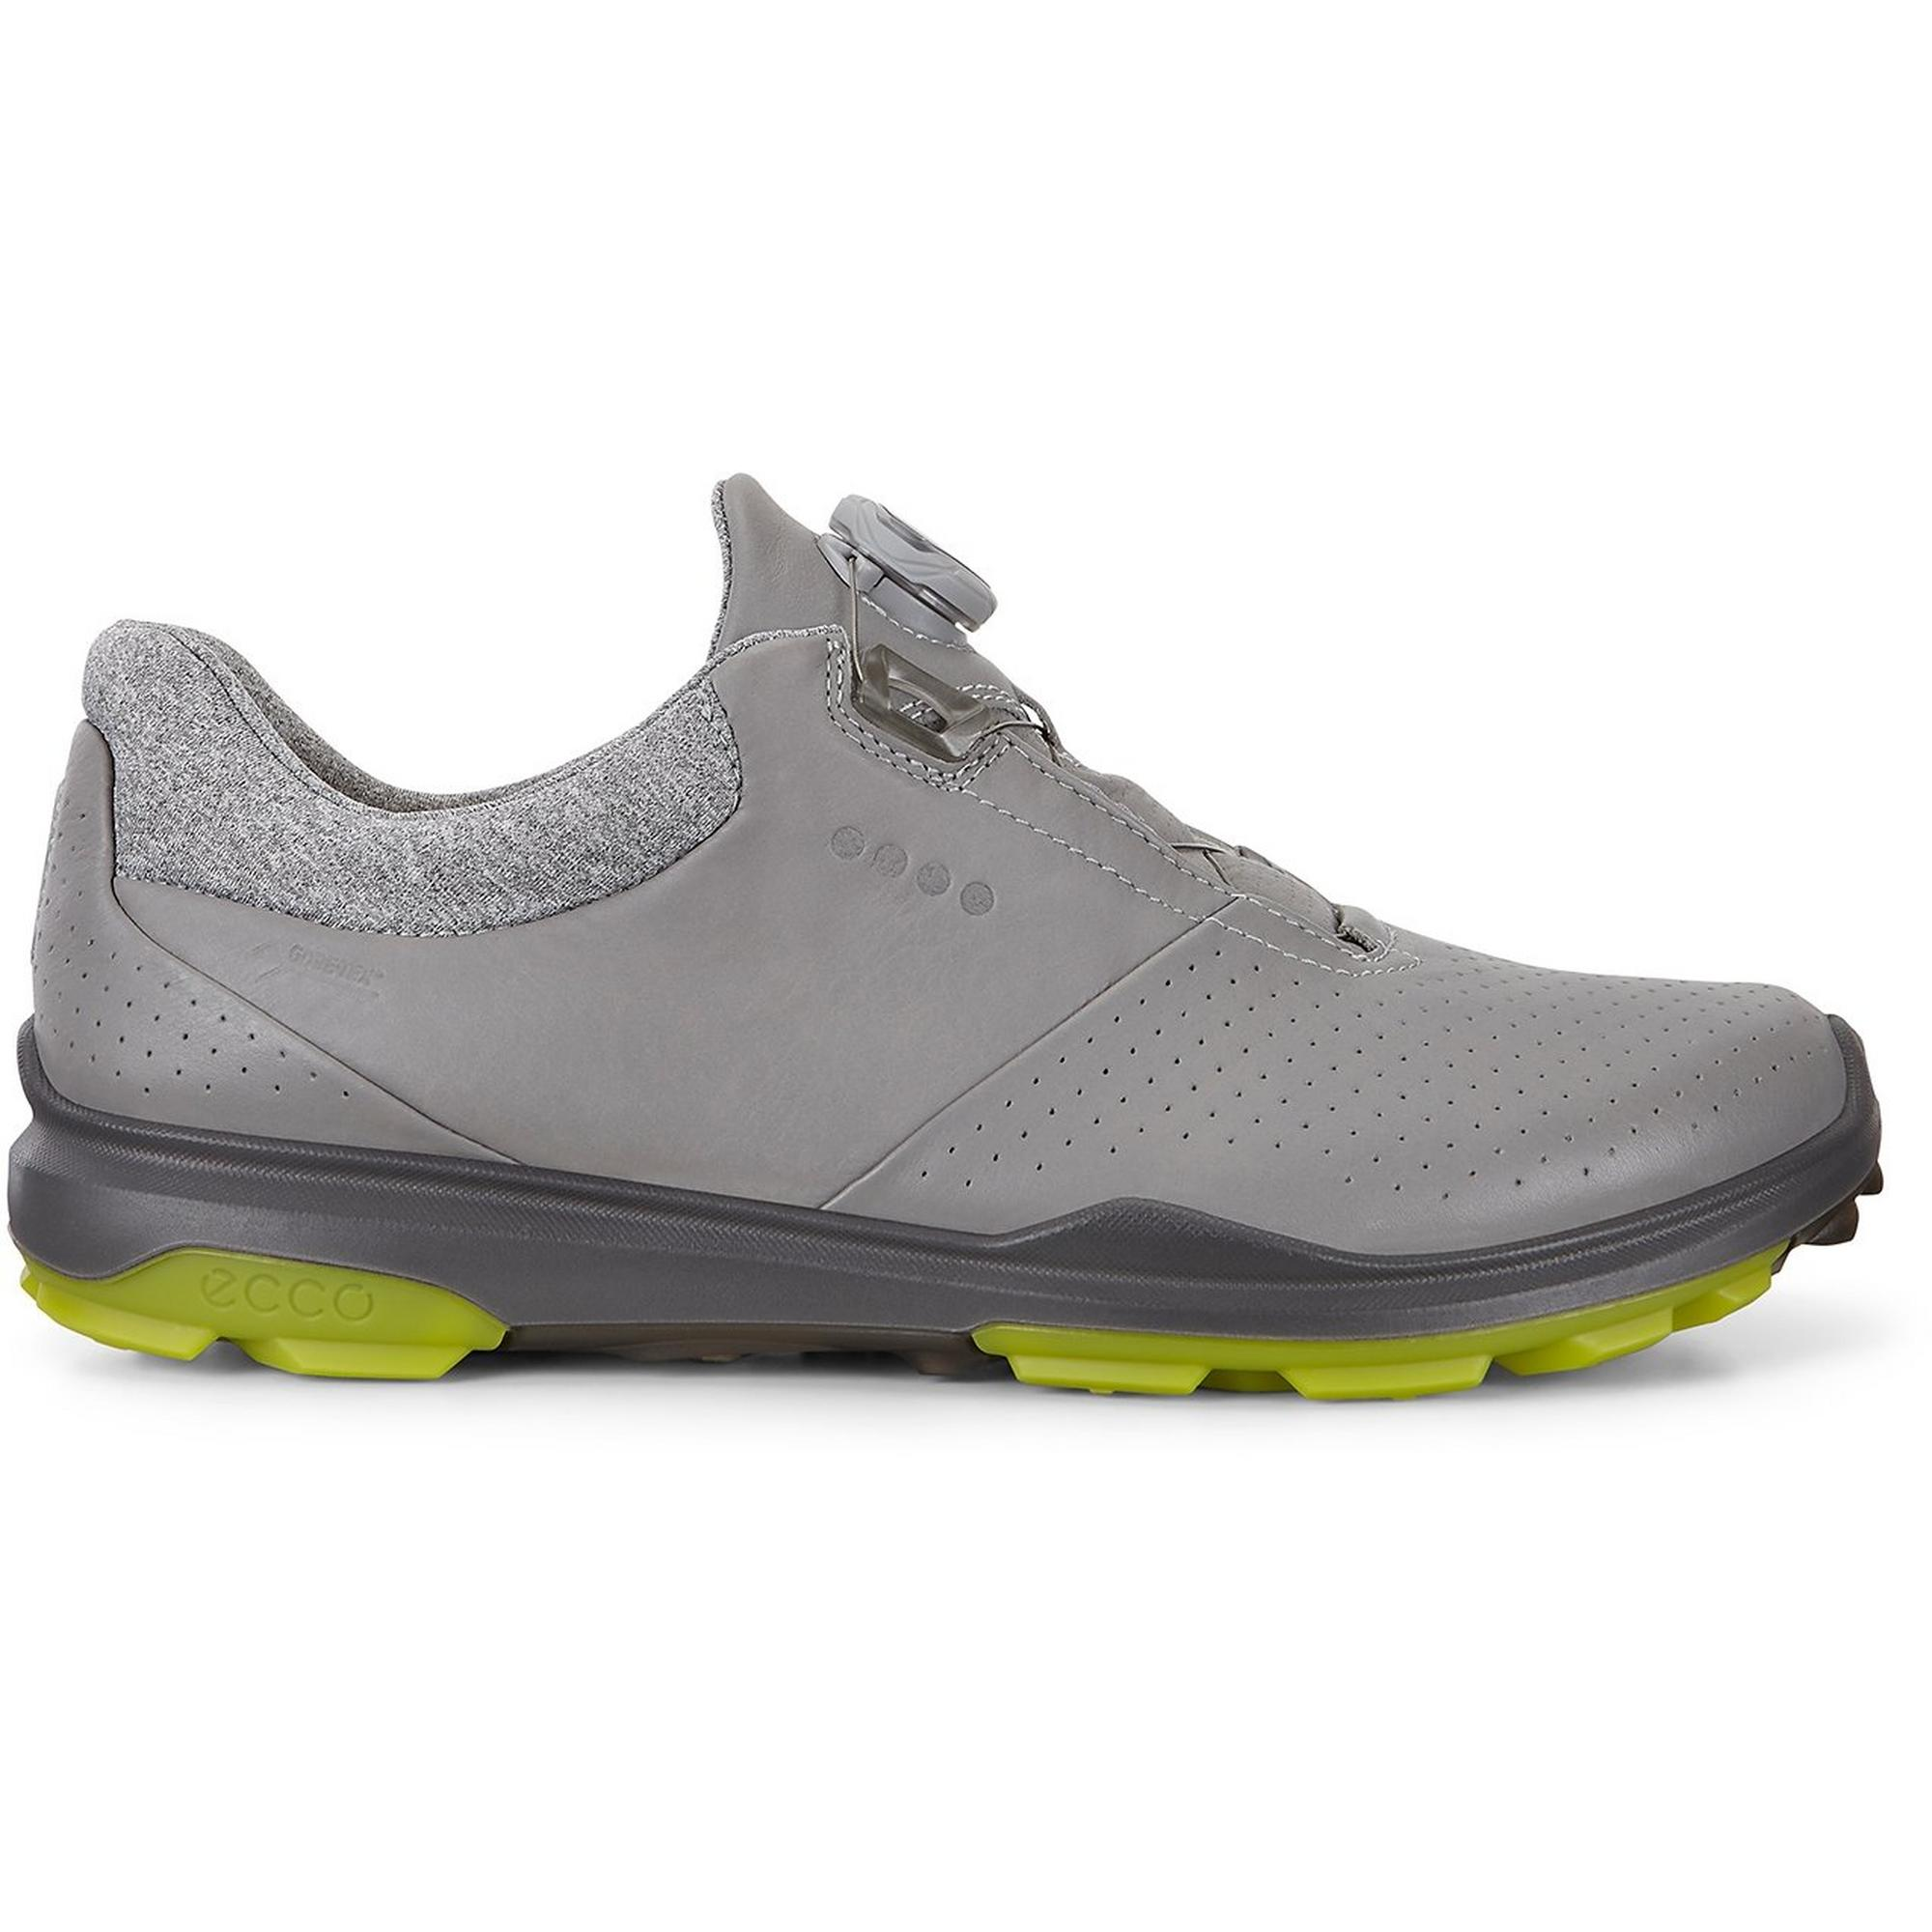 Men's Goretex Biom Hybrid 3 Boa Spikeless Golf Shoe - LTGRY/GRN